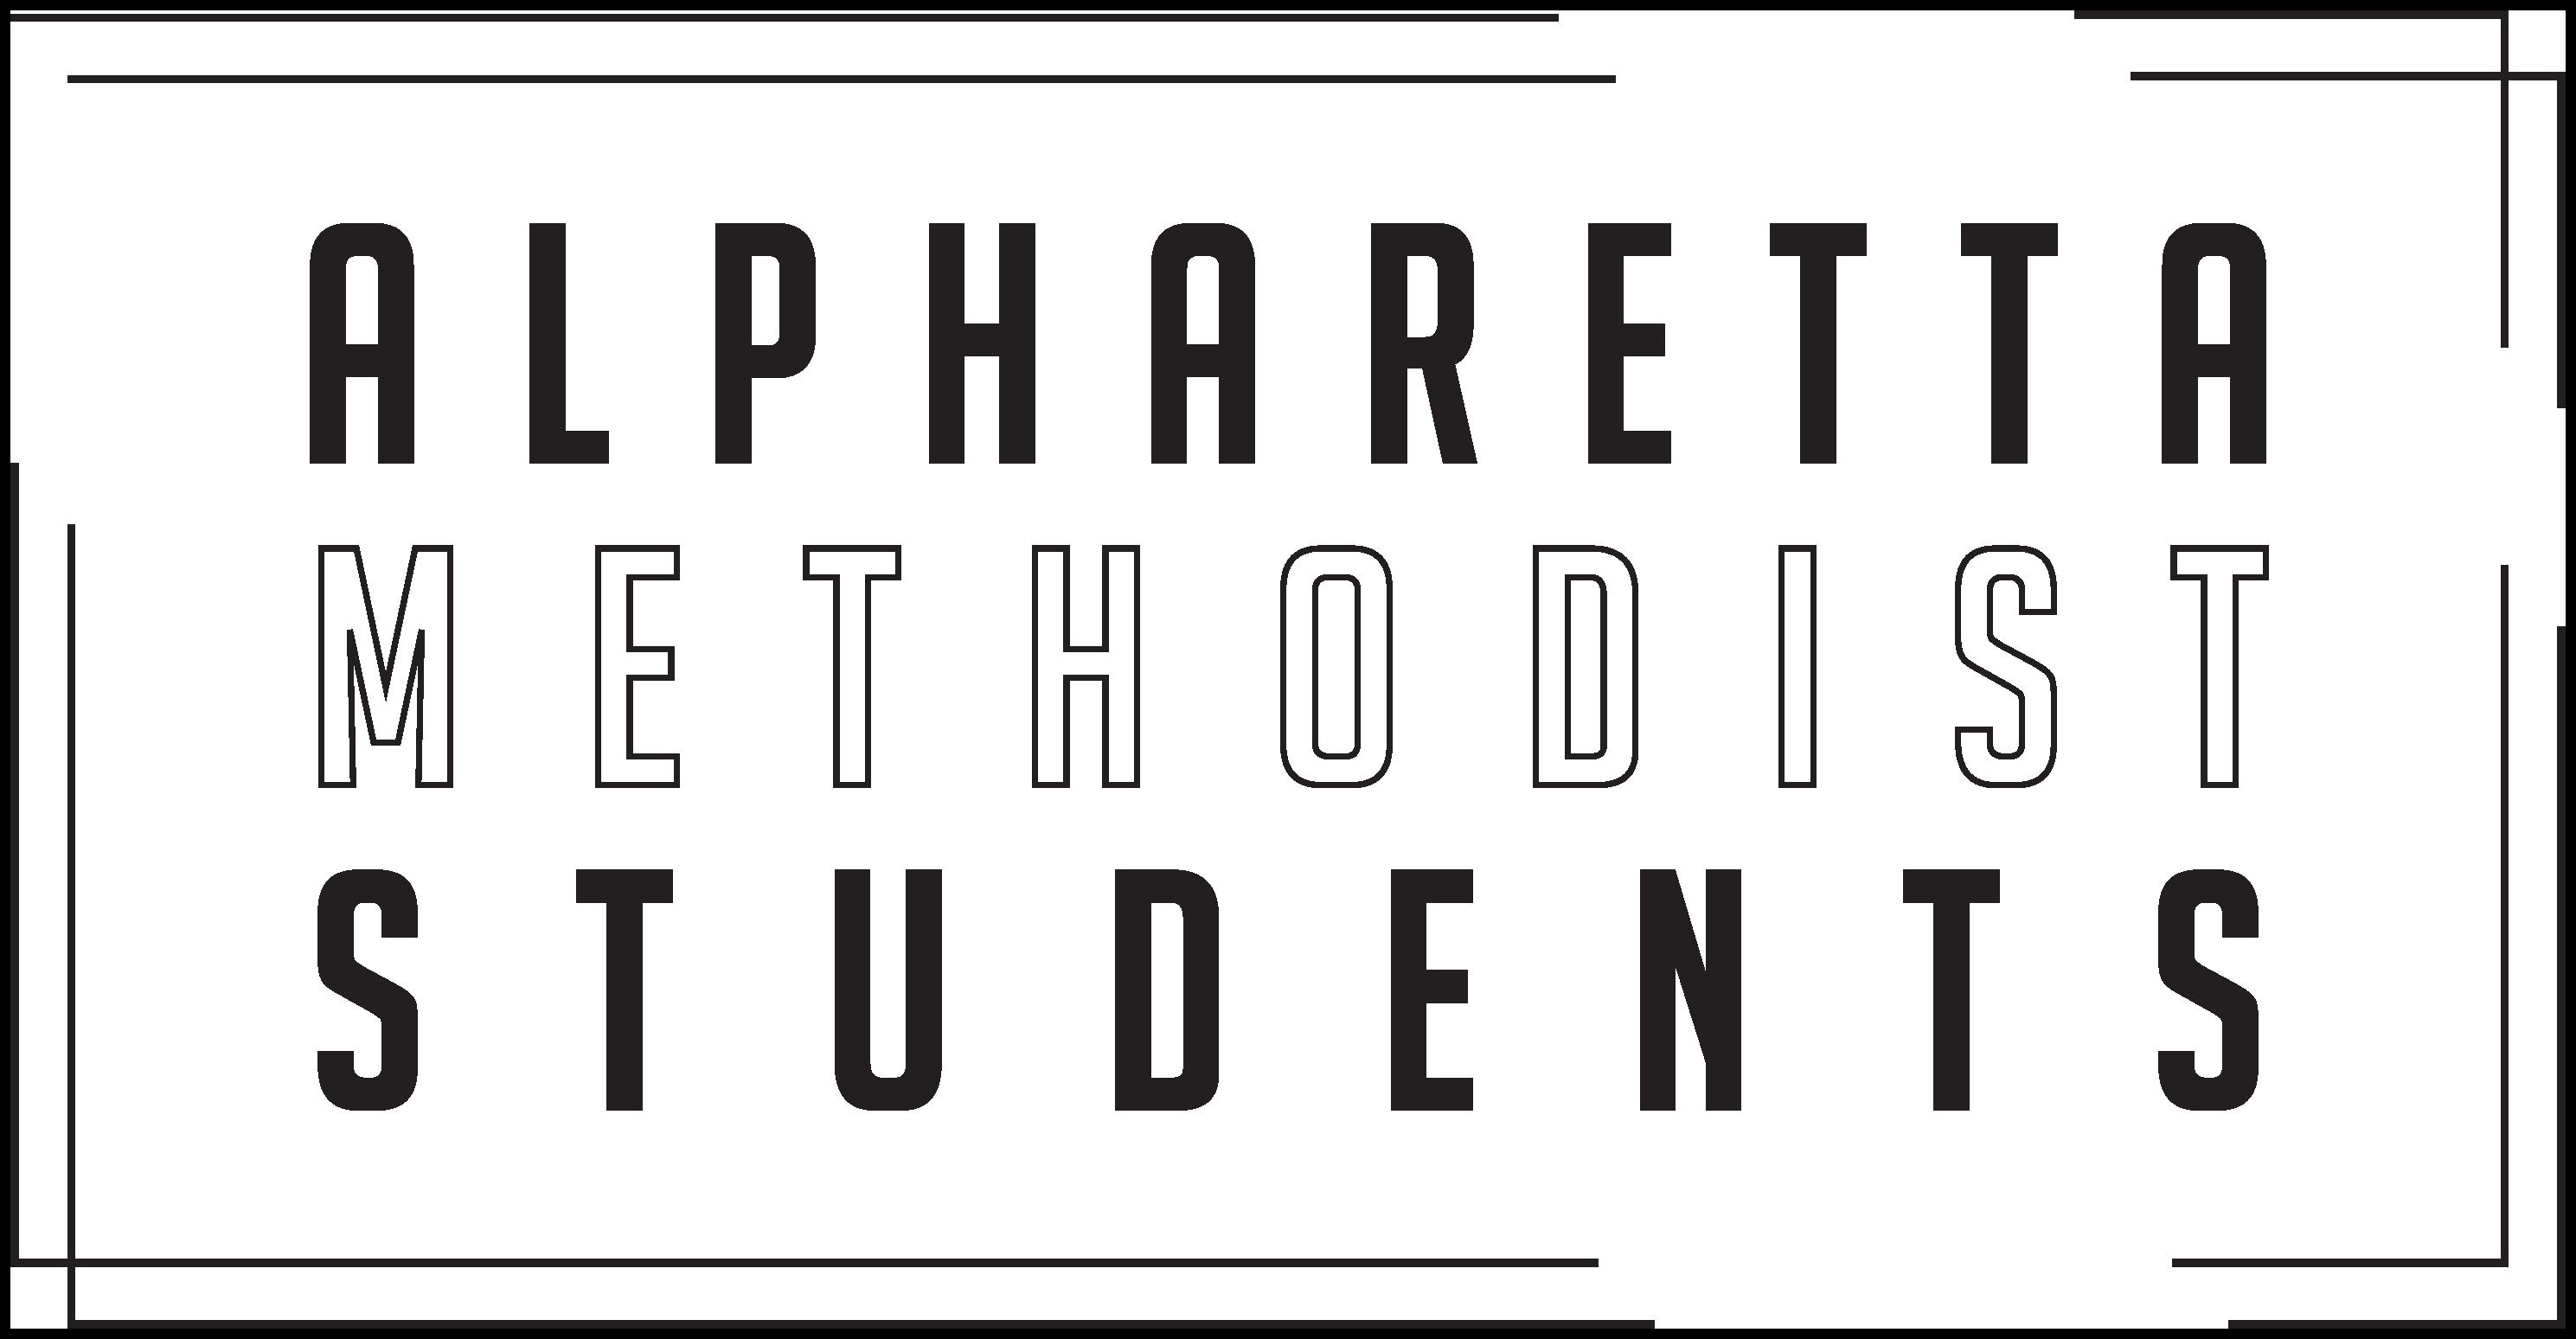 Alpharetta Methodist Students logo